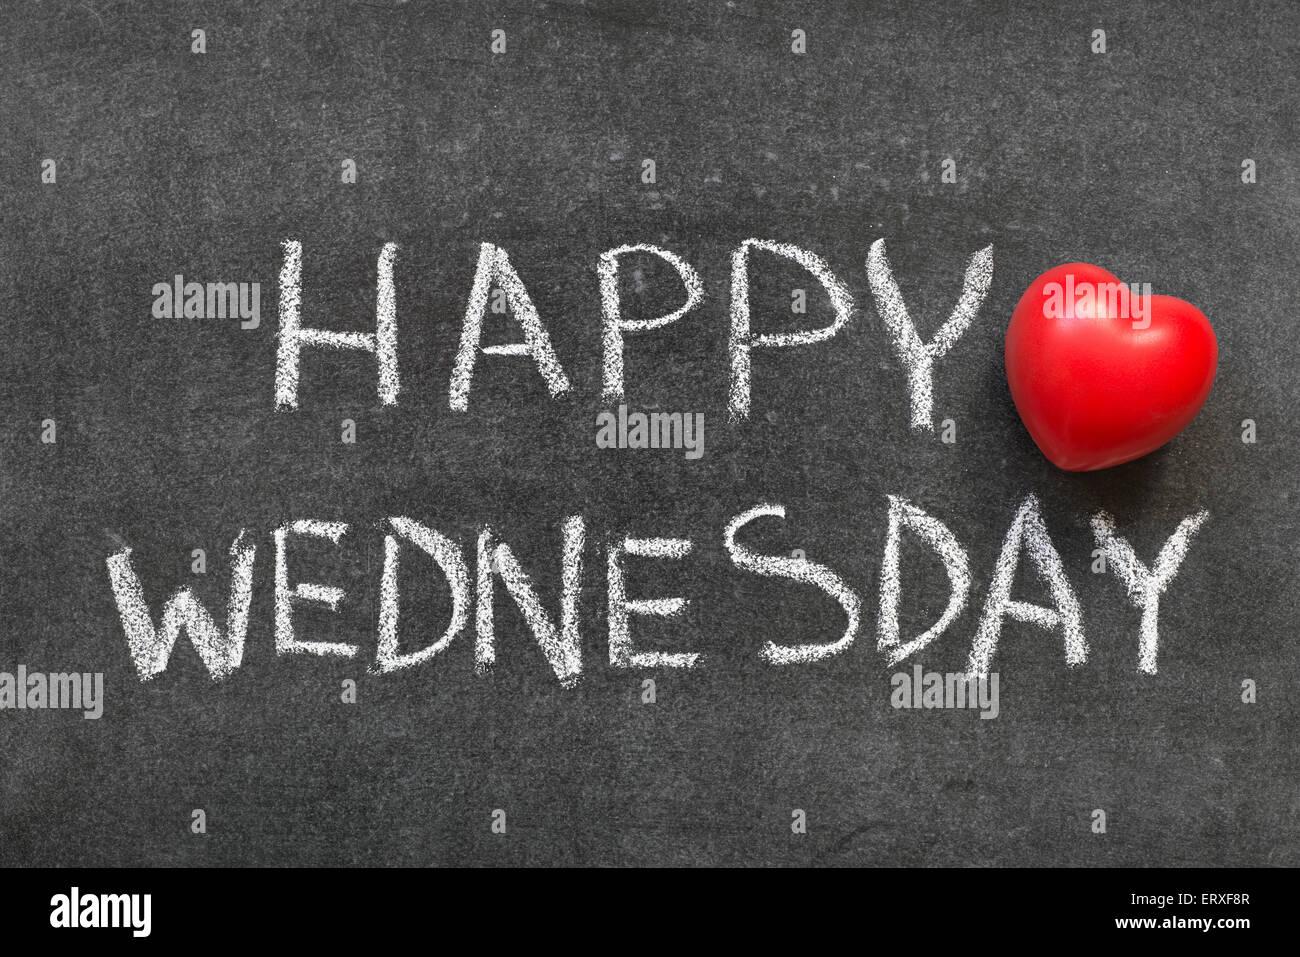 Happy wednesday phrase handwritten on blackboard with heart symbol happy wednesday phrase handwritten on blackboard with heart symbol instead of o biocorpaavc